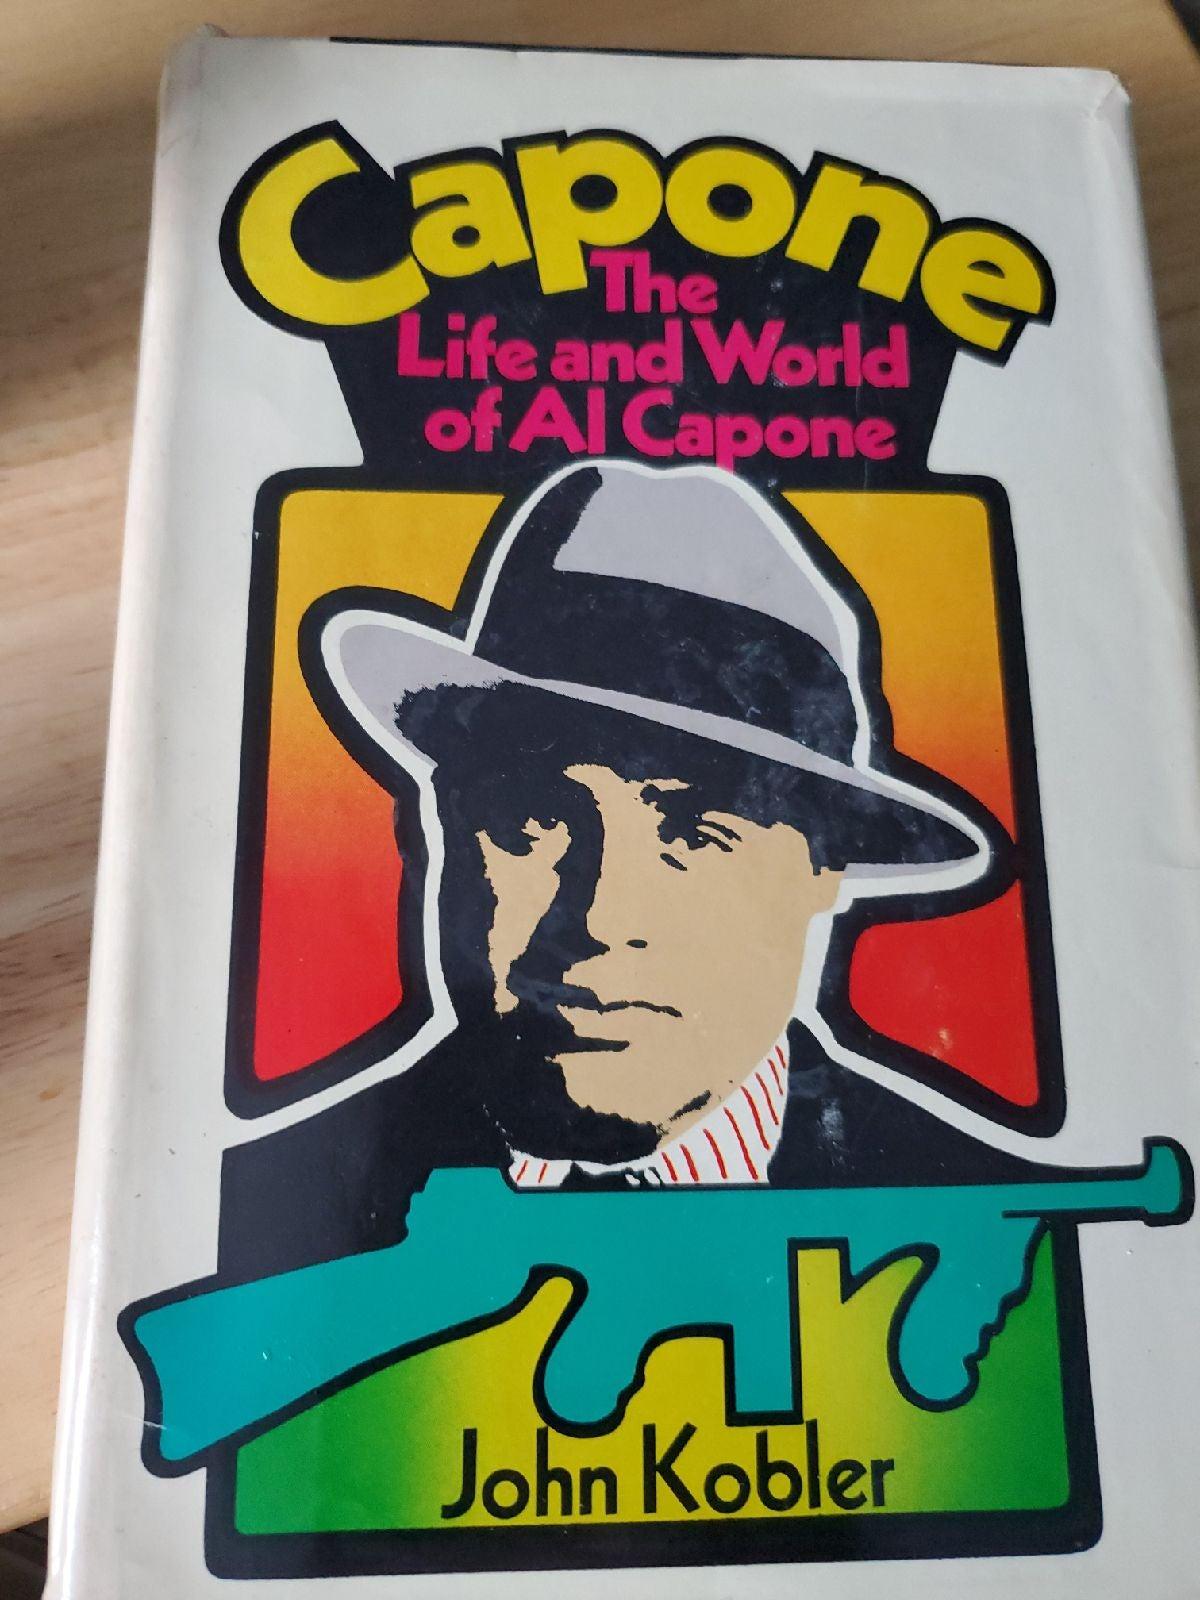 Capone: The Life and World of Al Copone